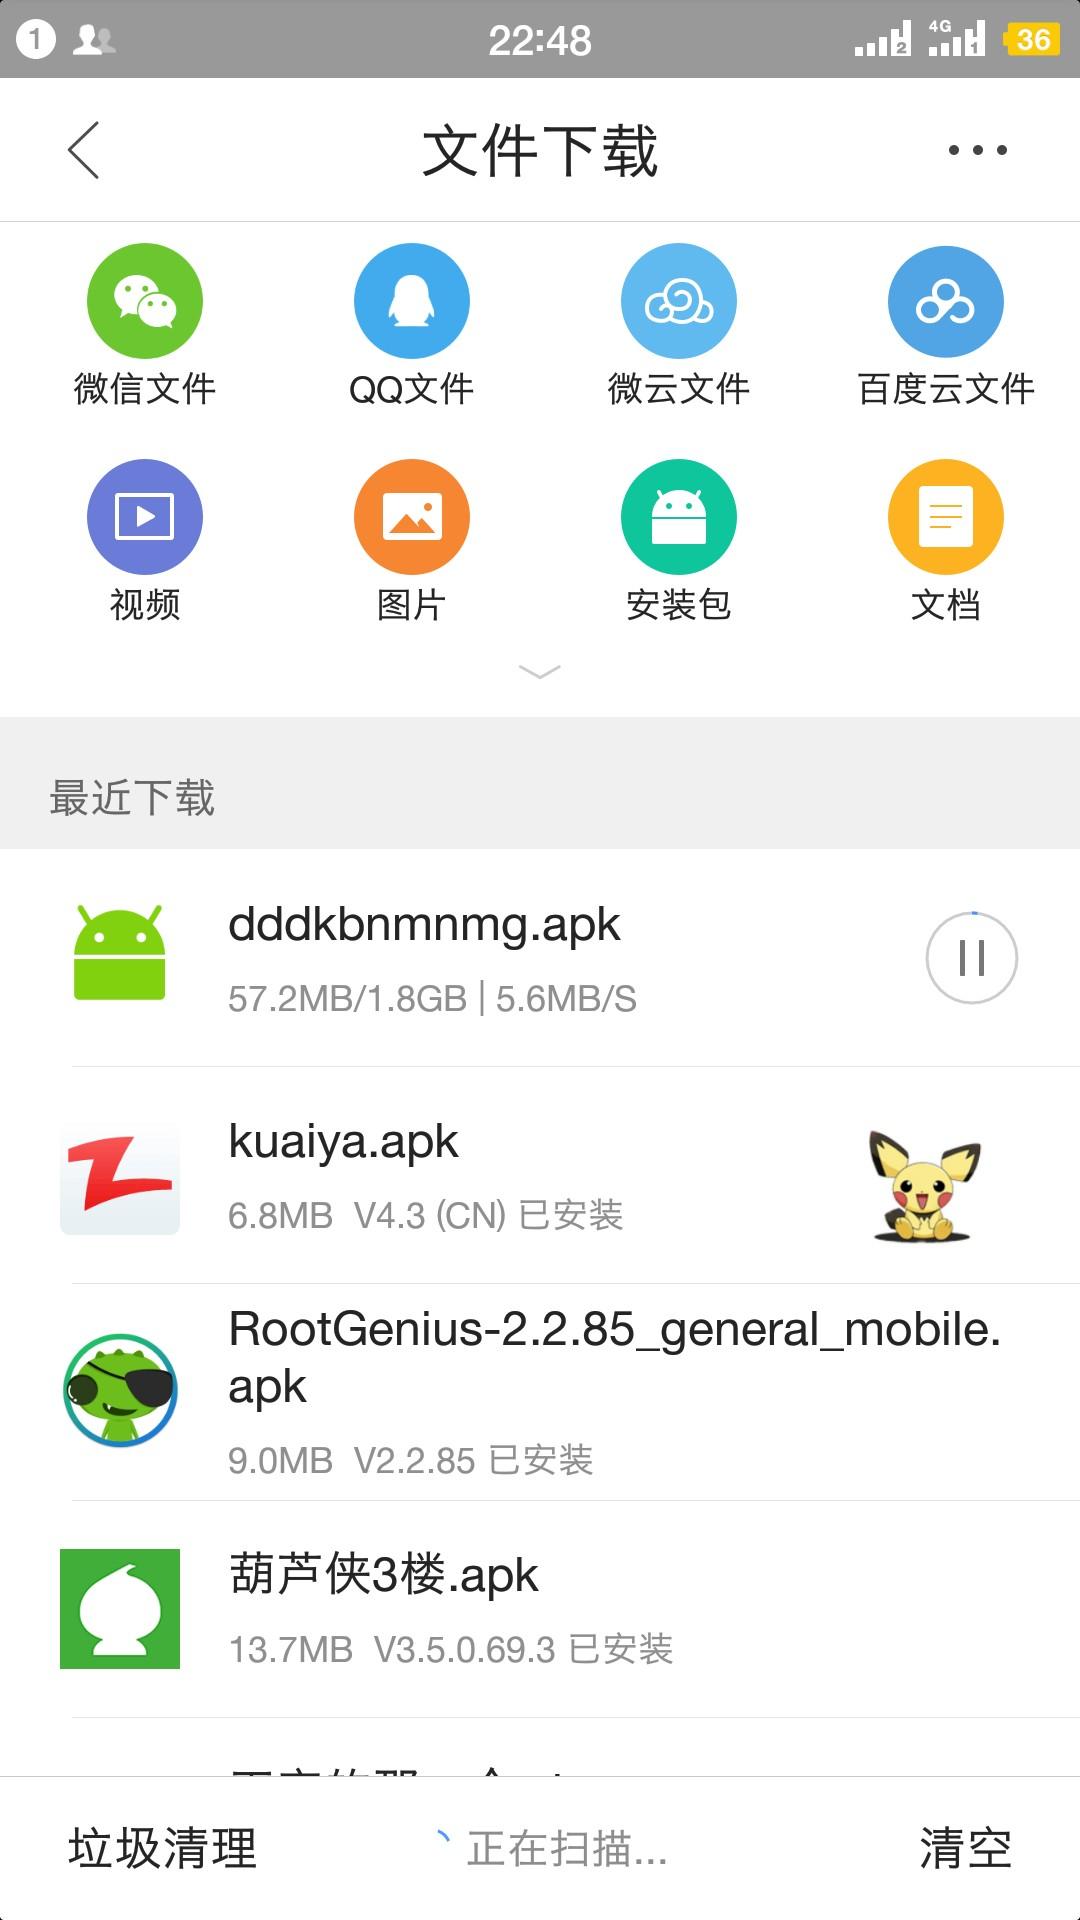 Screenshot_2017-09-15-22-48-56-290_QQ???.png